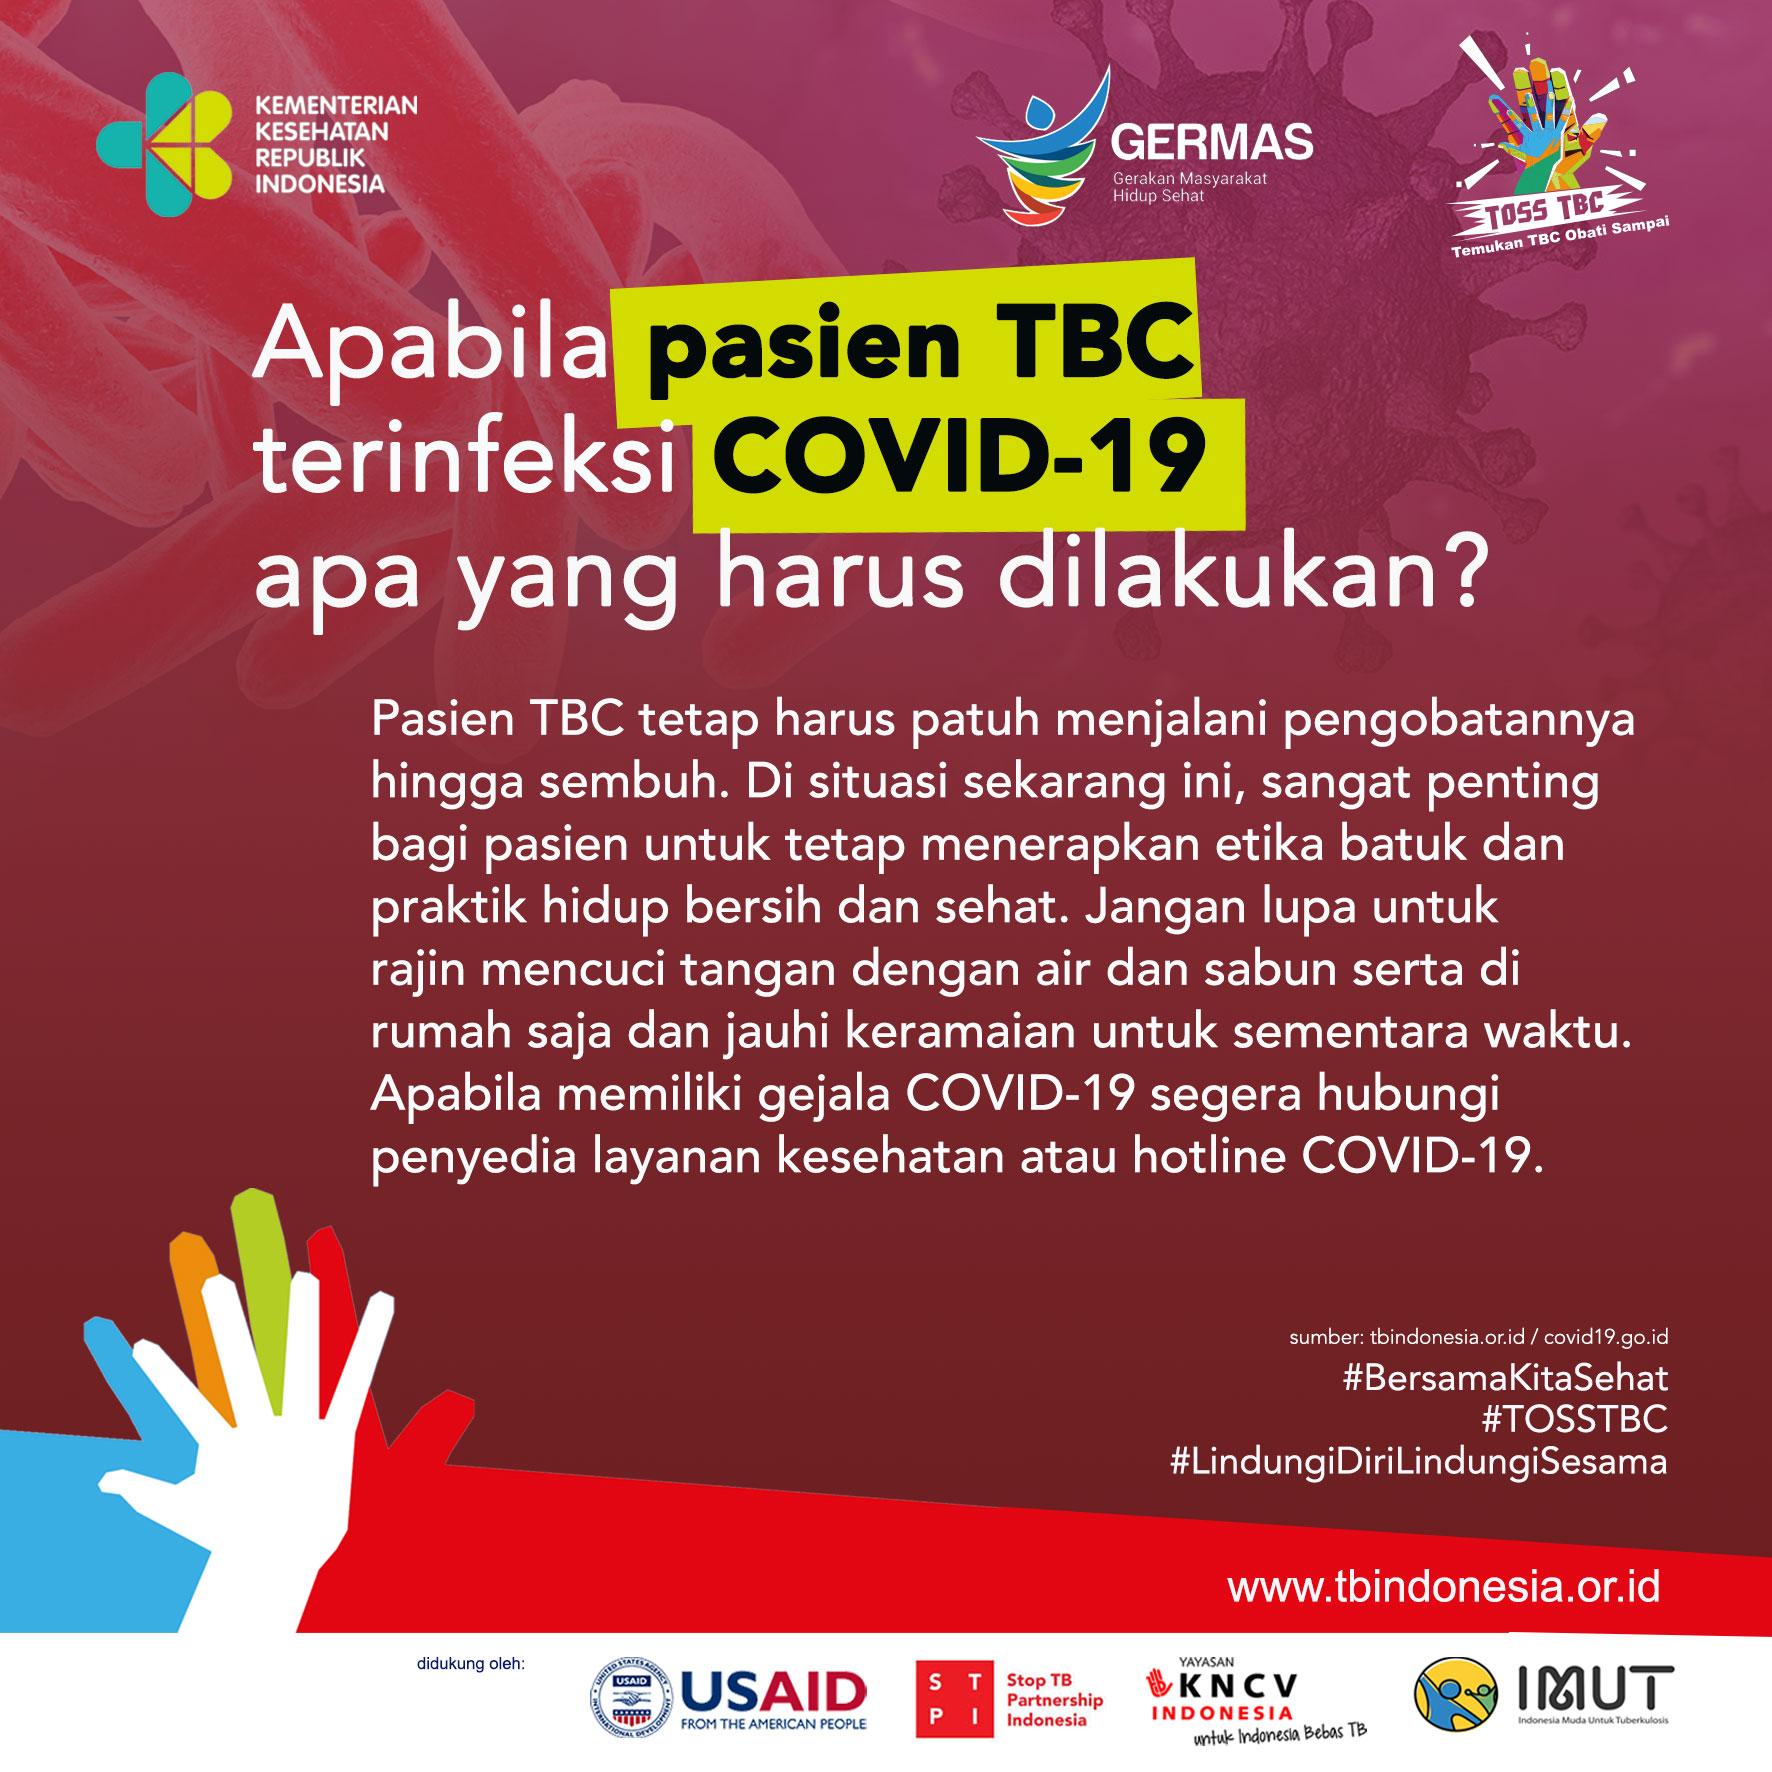 TB Terinfeksi Covid